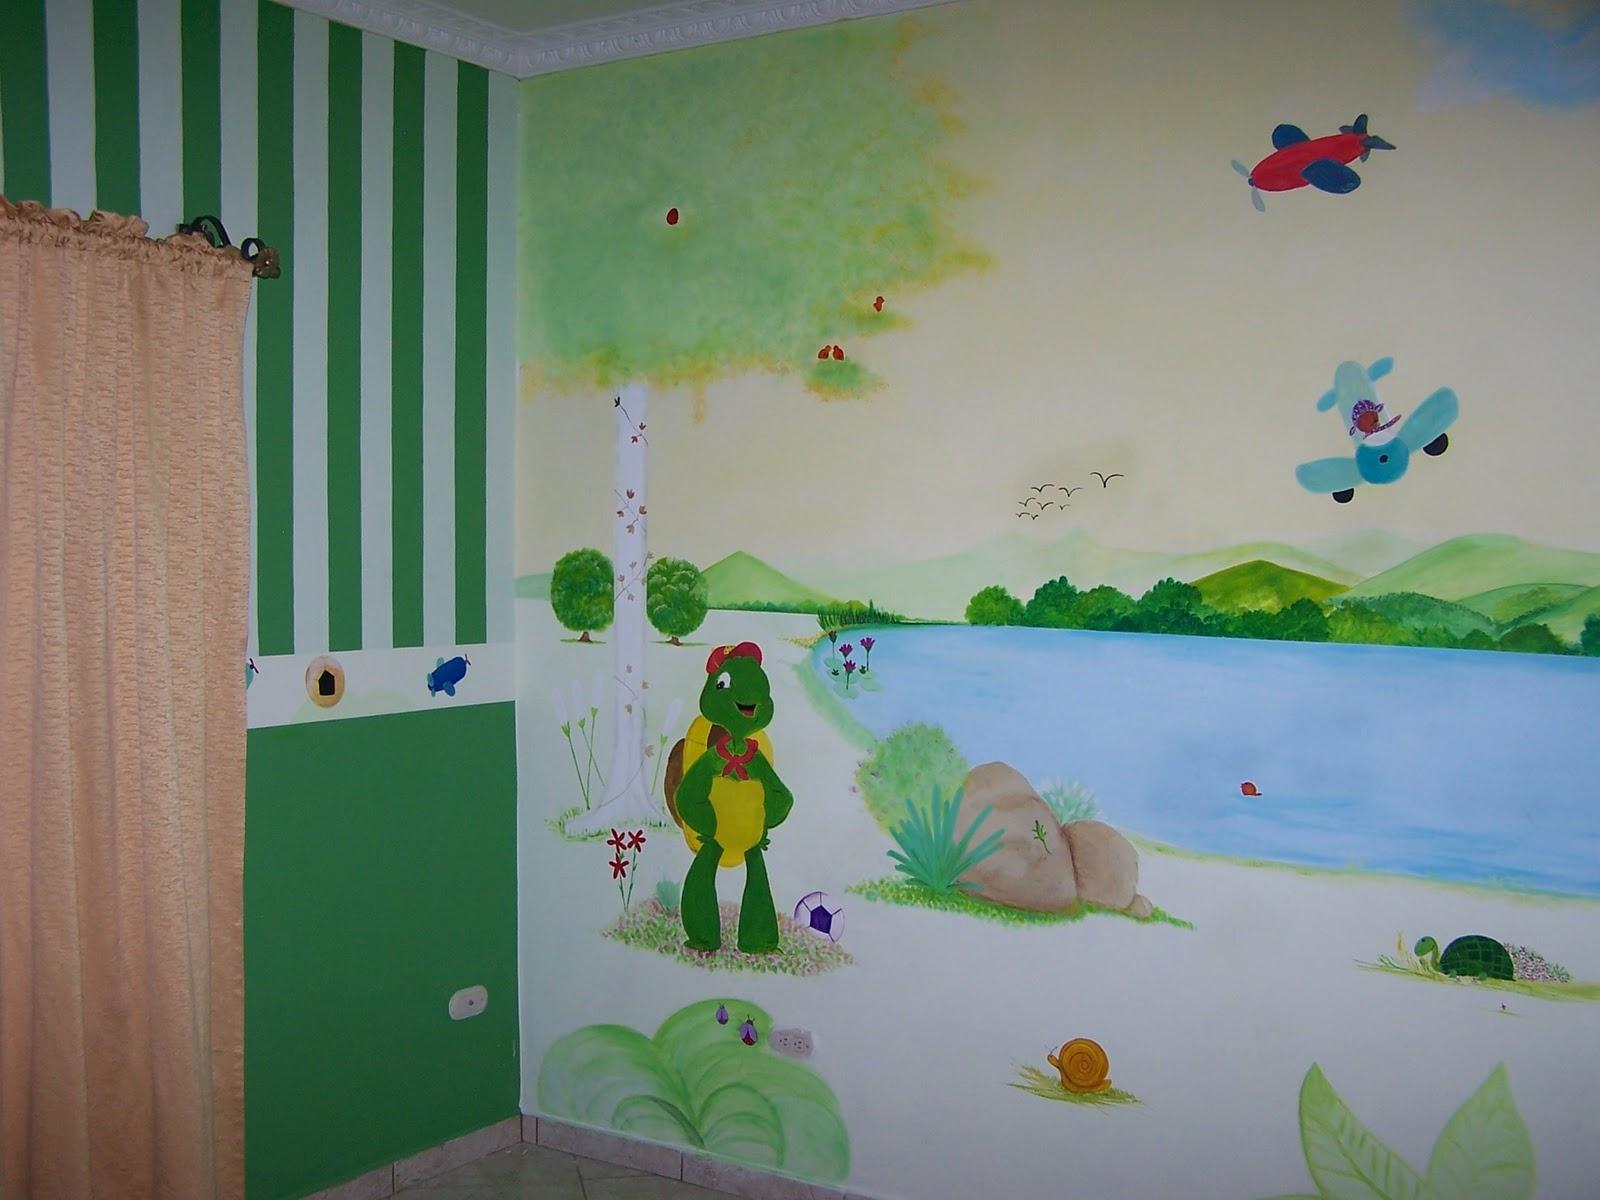 Matices pintura decorativa mural habitaci n ni o - Pintura habitacion ninos ...